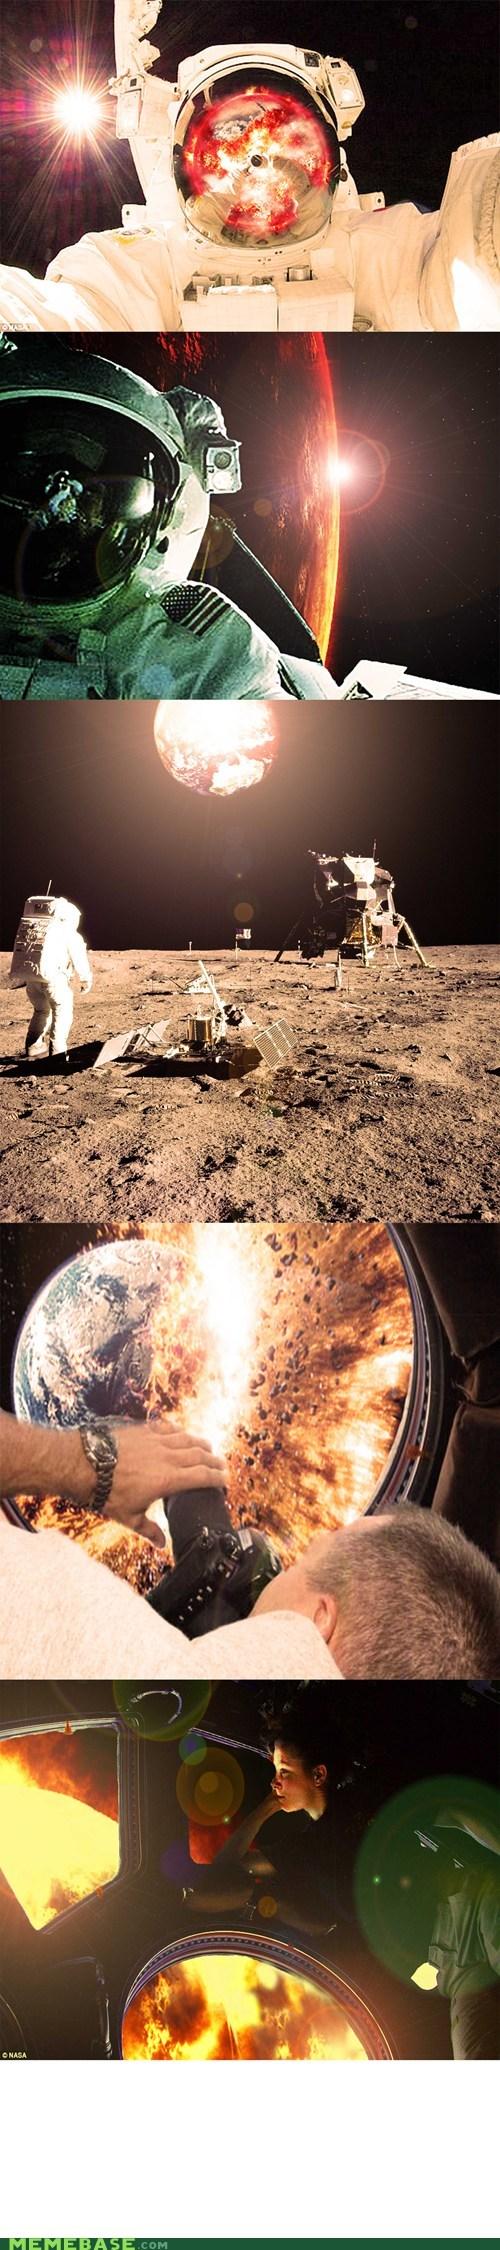 world burn,photoshop,astronaut,space